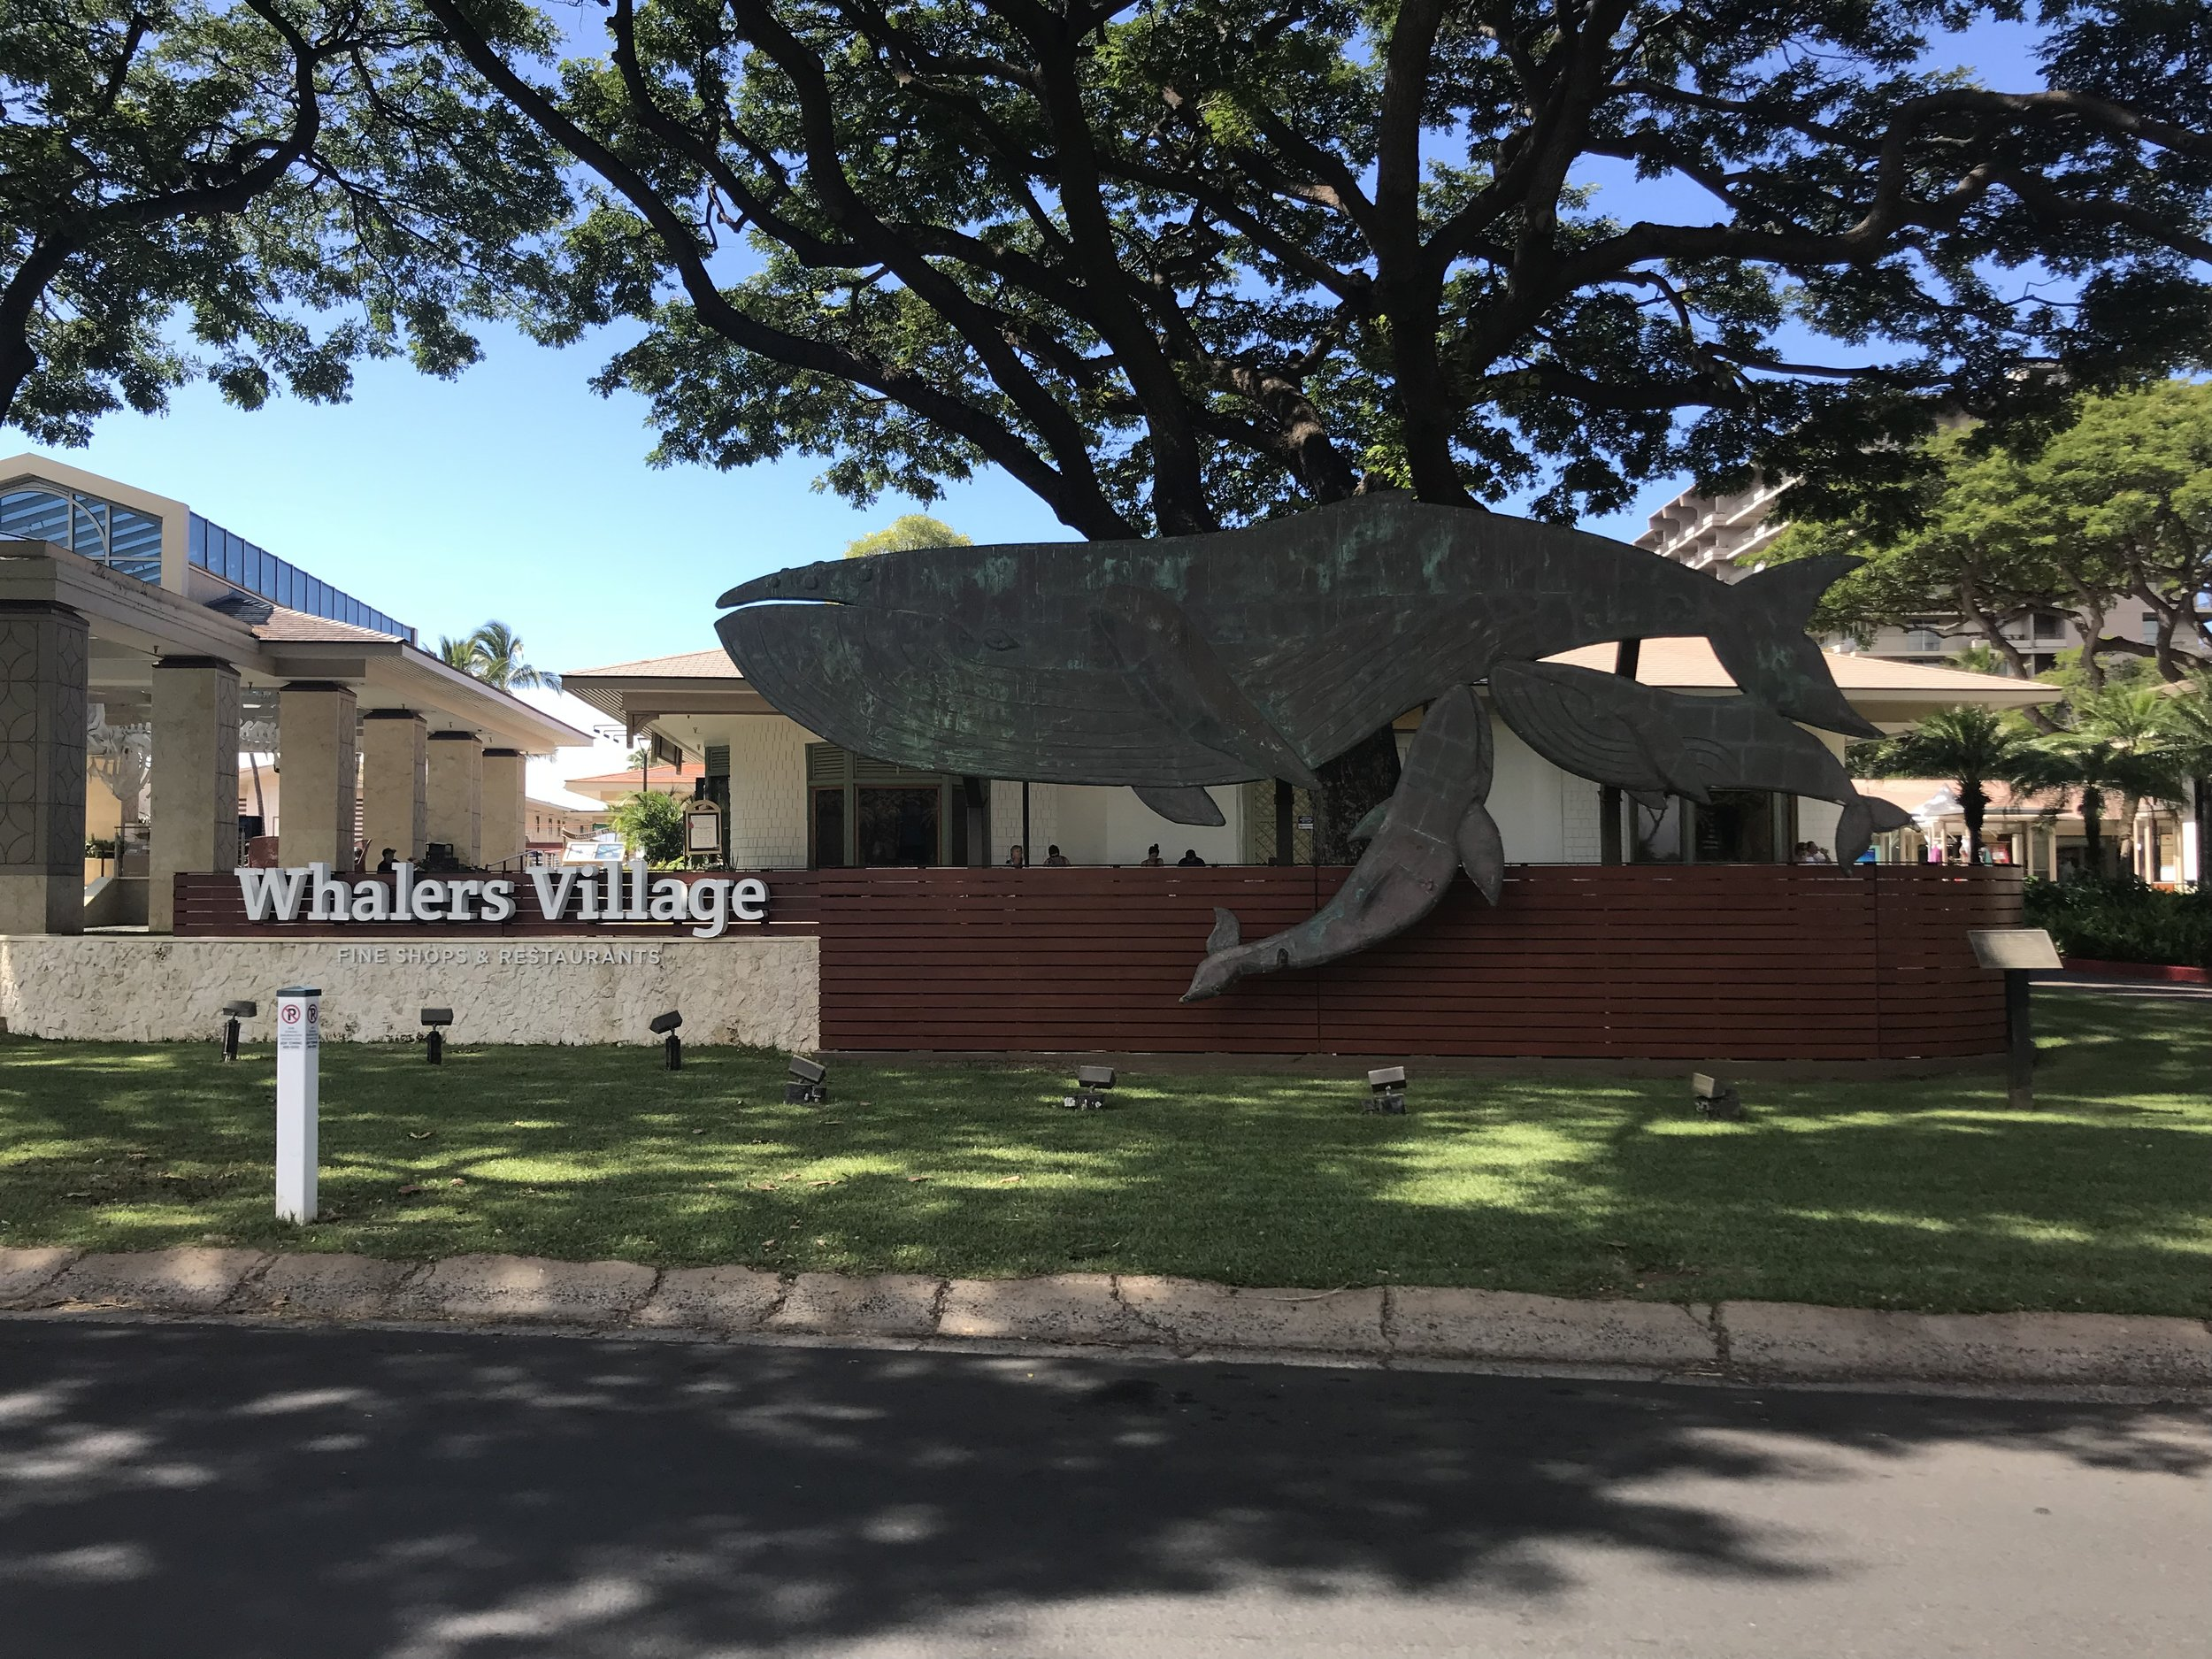 Whalers Village - Kaanapali - Maui, Hawaii